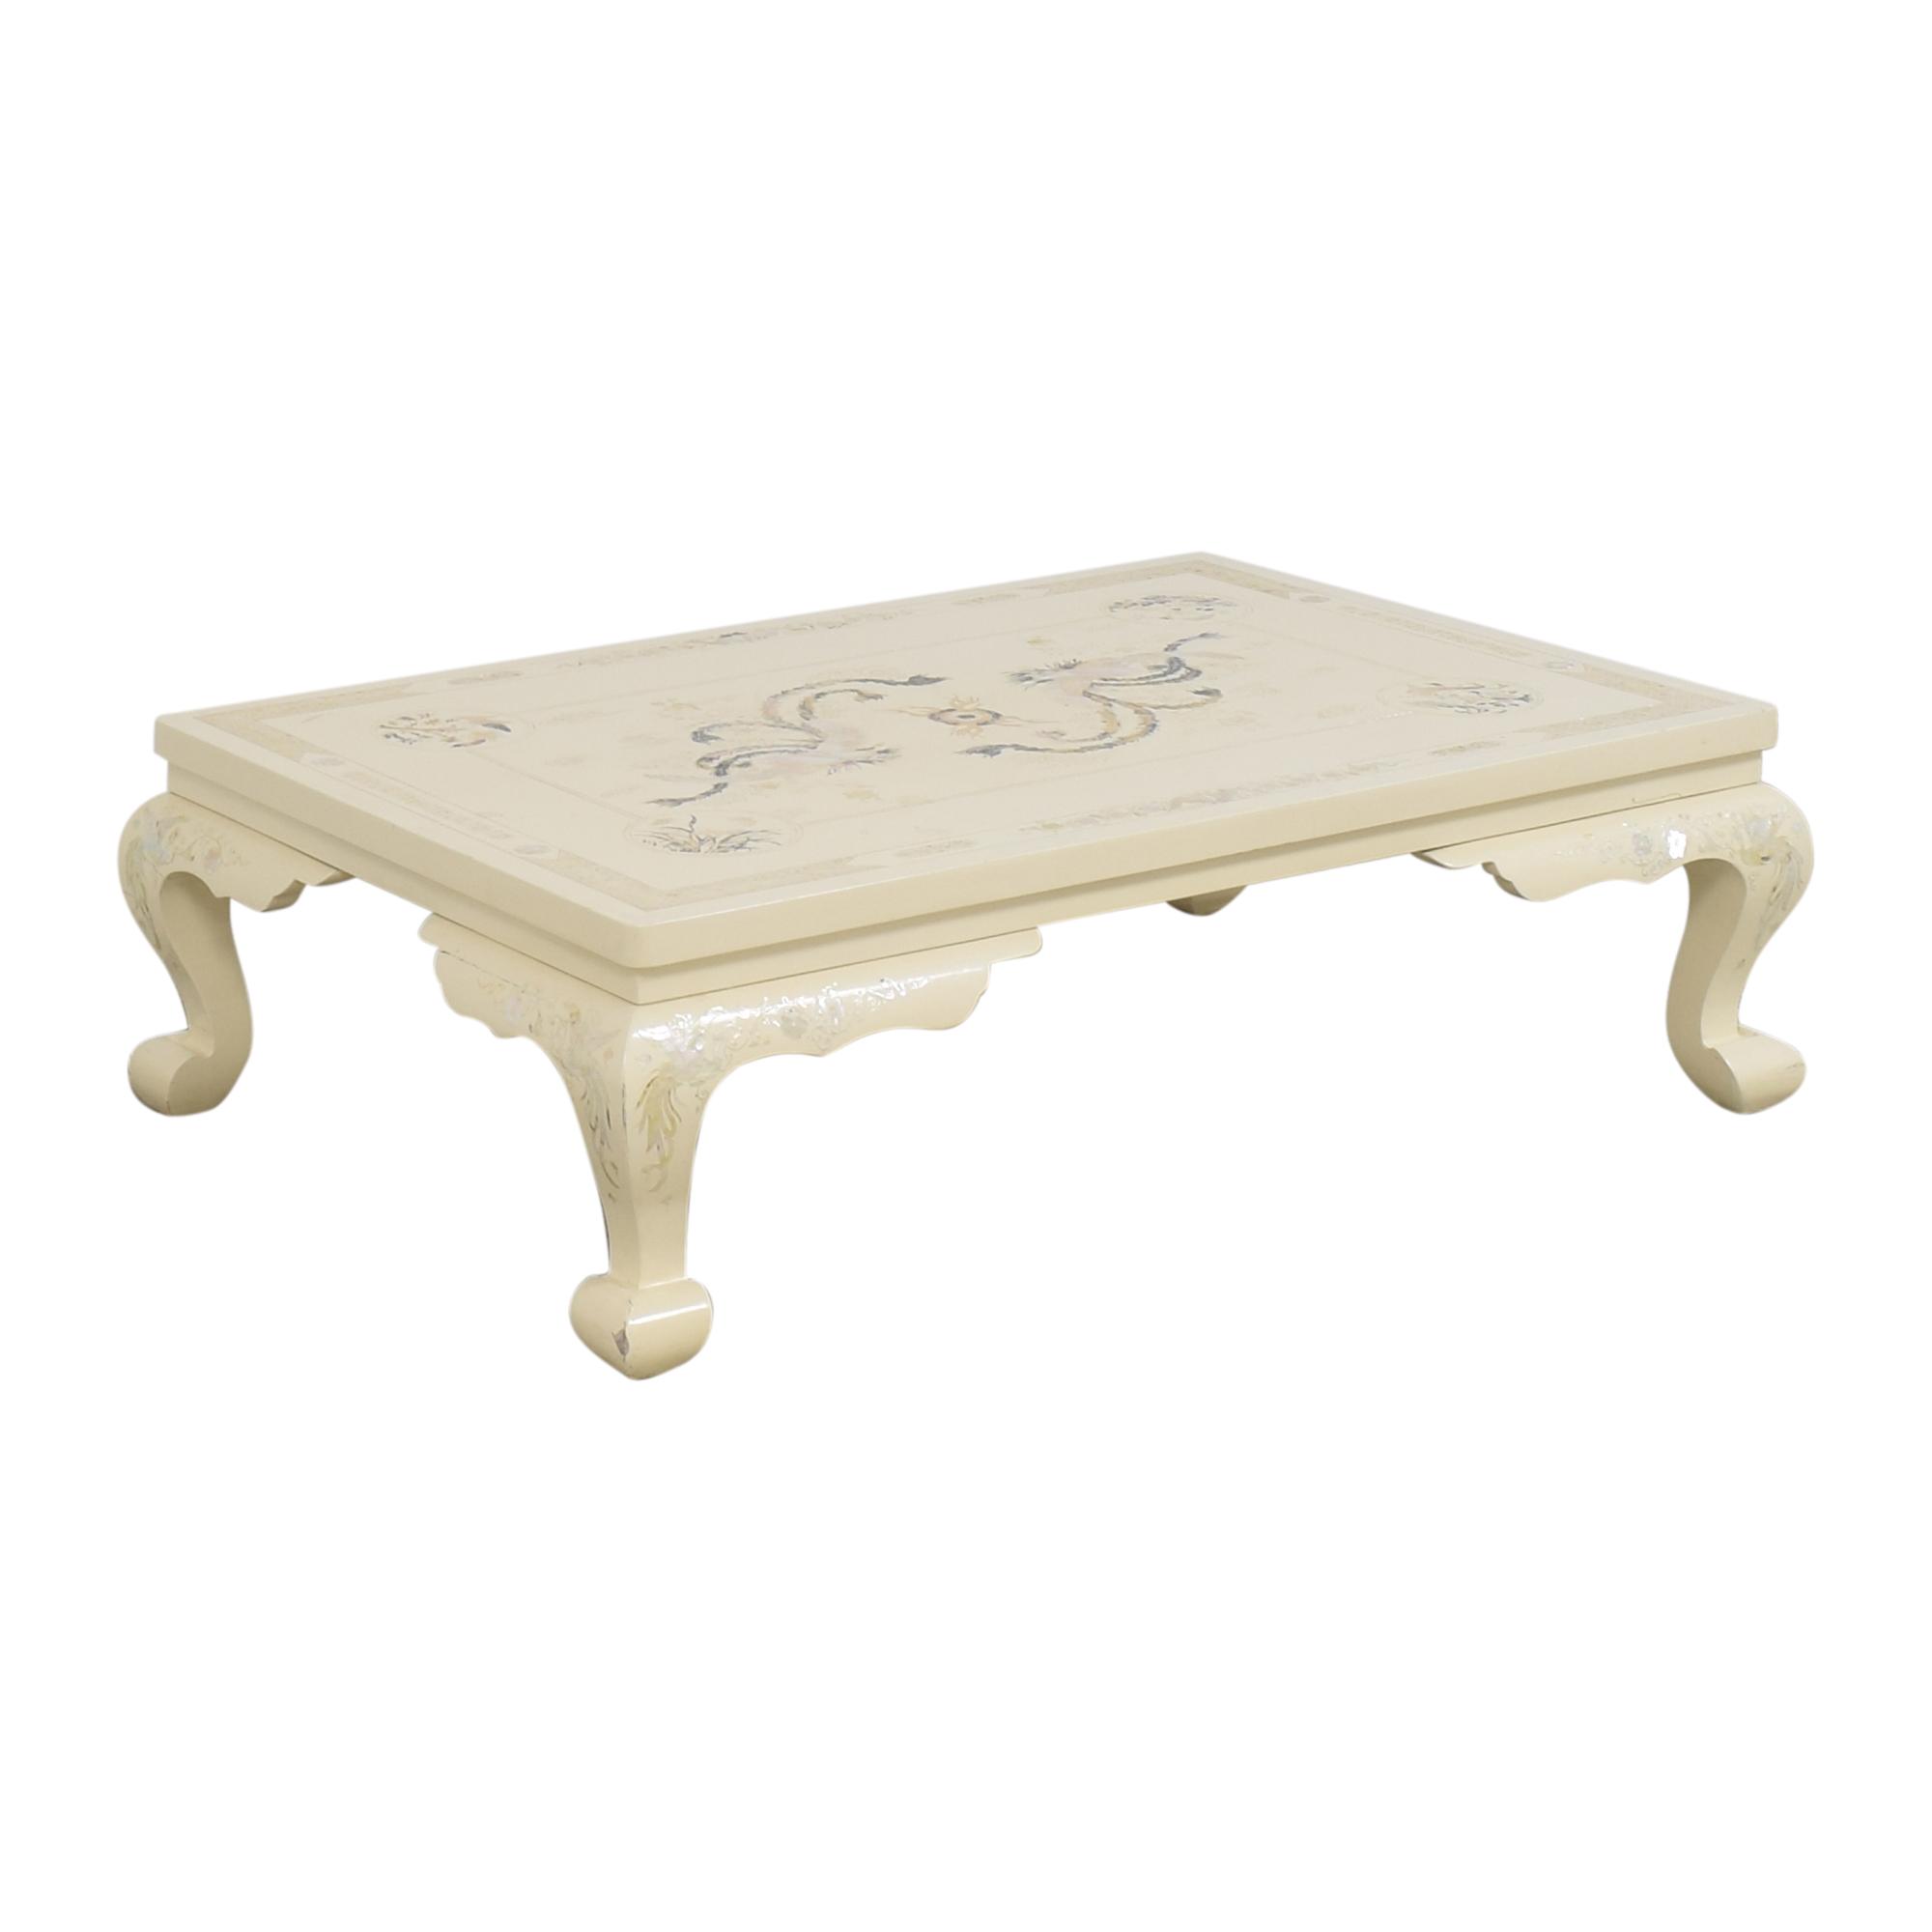 Inlay Coffee Table used